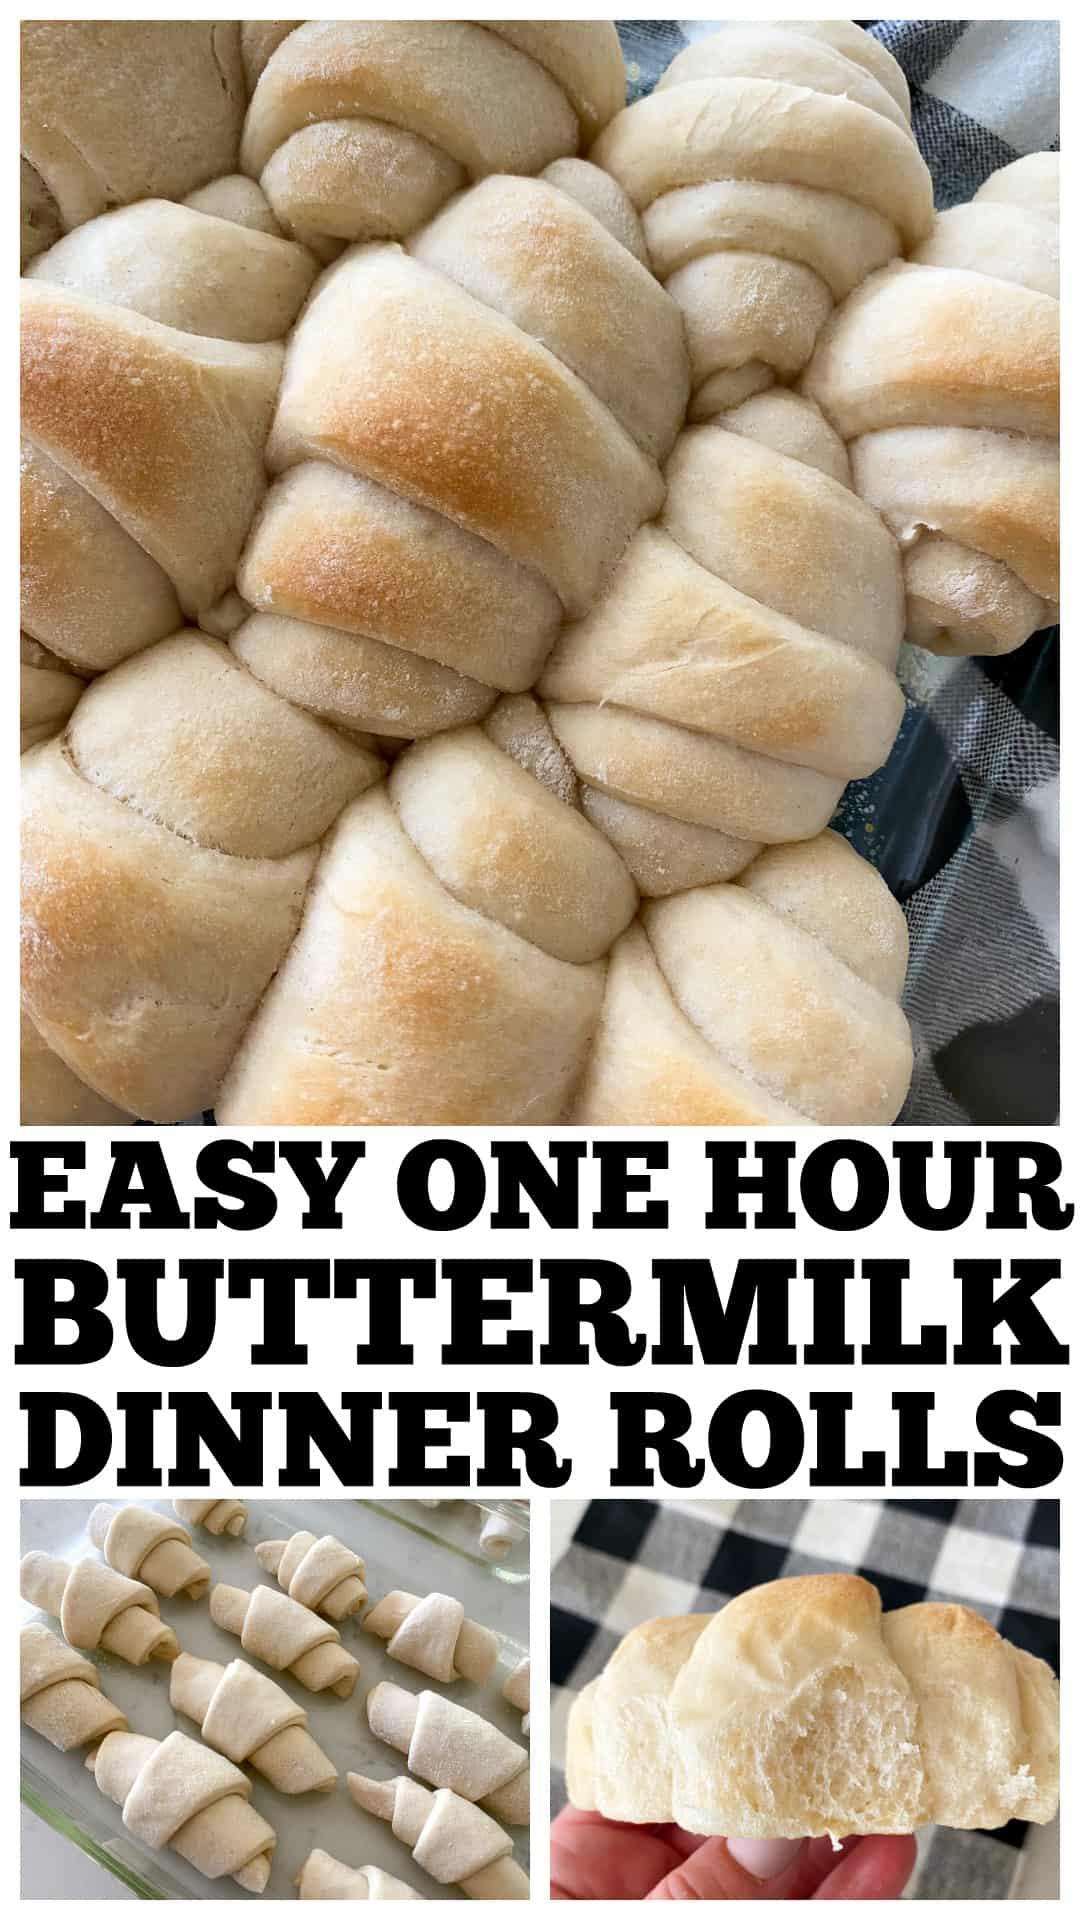 dinner rolls photo collage